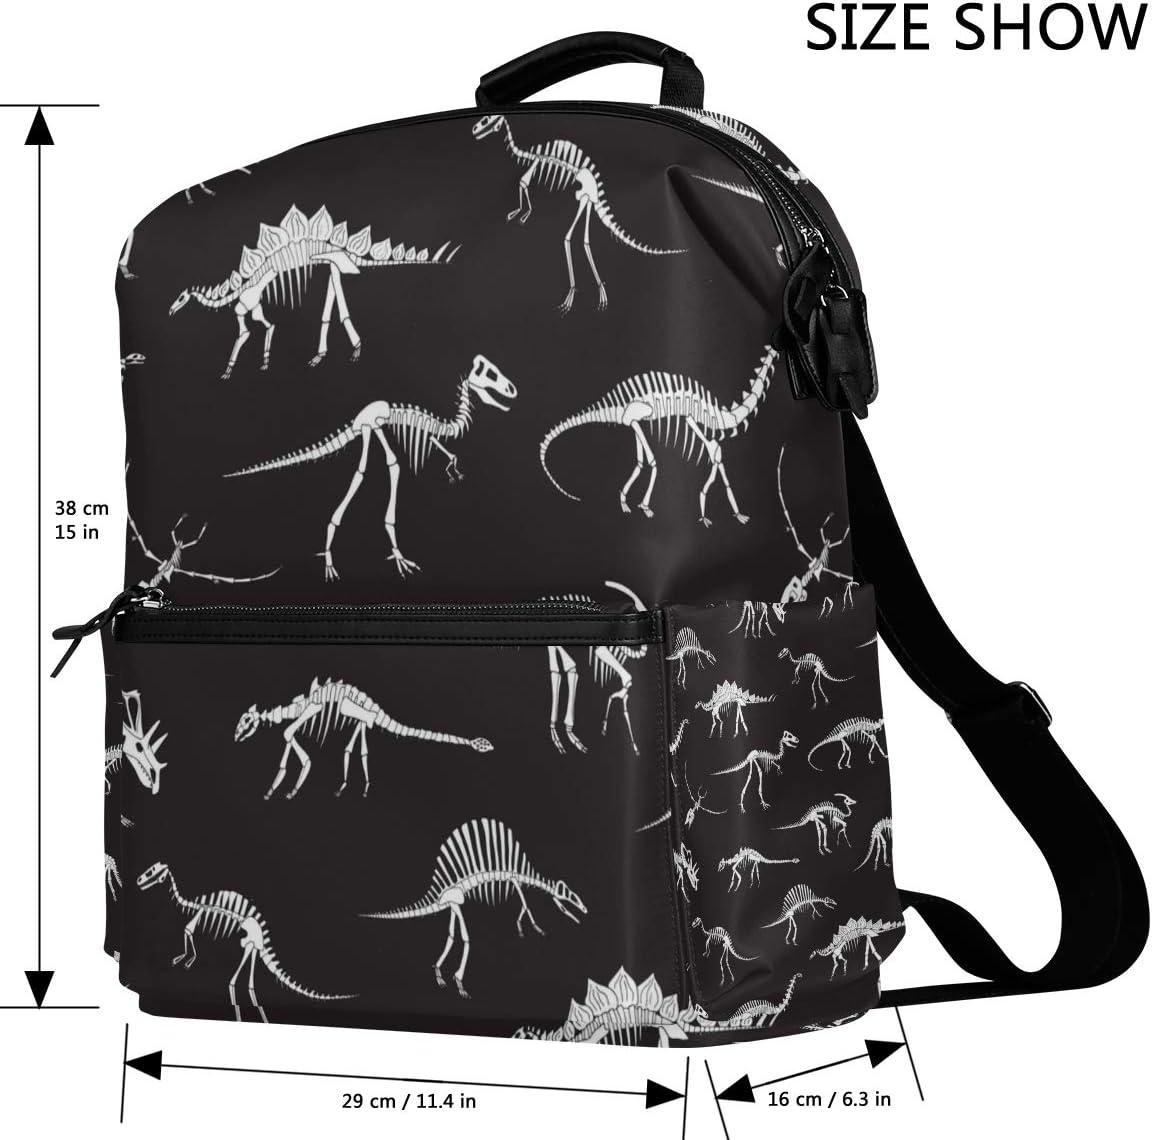 ColourLife Book Bag Dinosaur Fossils Laptop Backpack Casual Daypack School Bag for Men Women Student